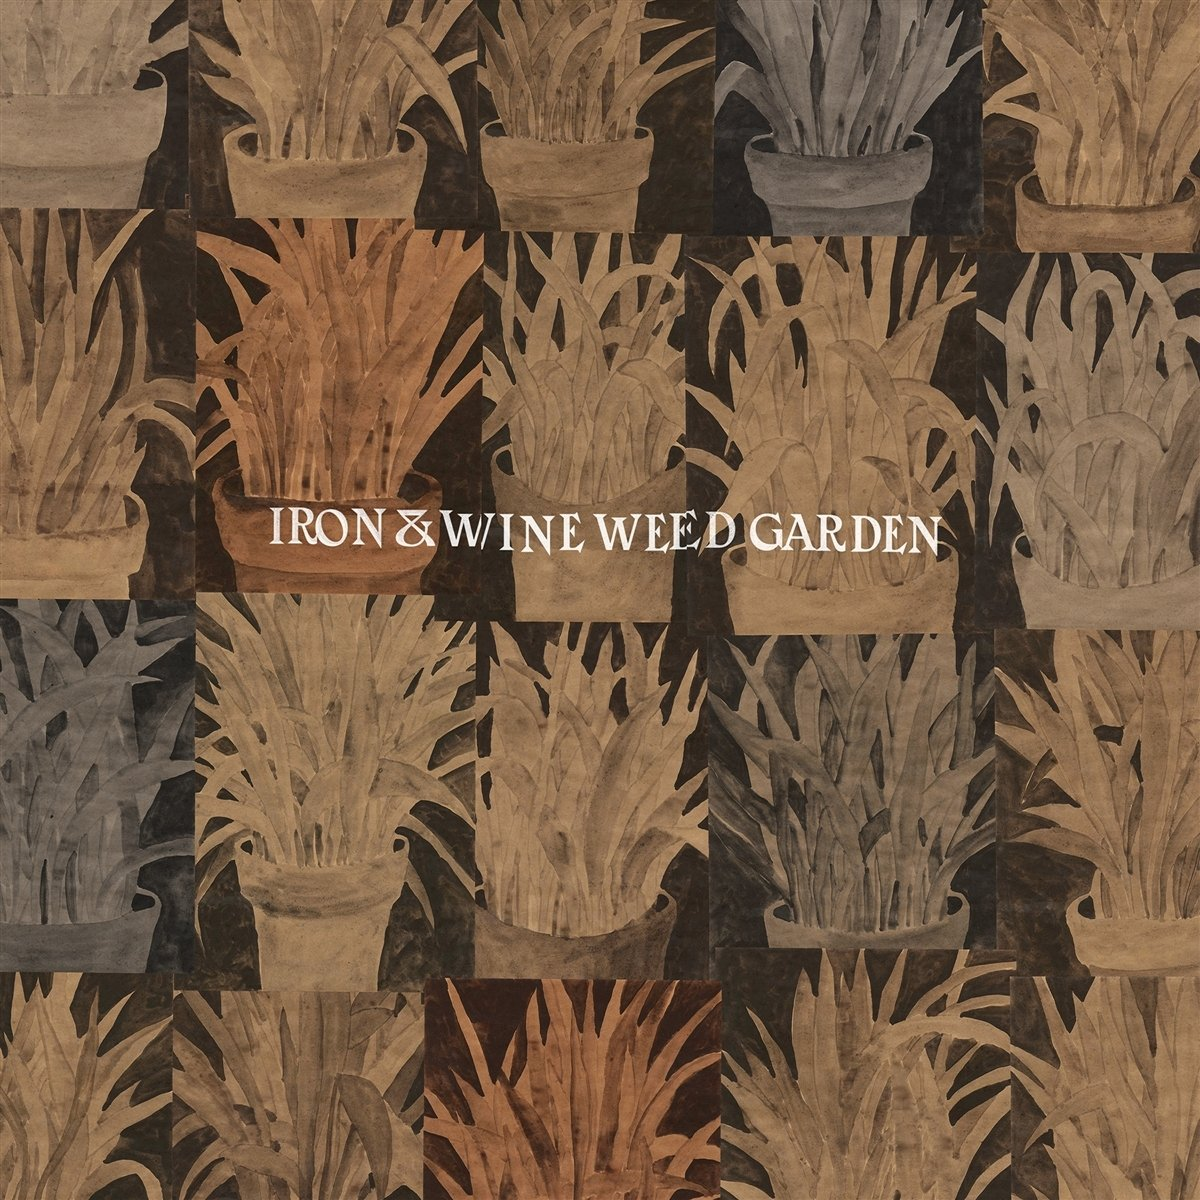 Cassette : Iron & Wine - Weed Garden (Cassette)